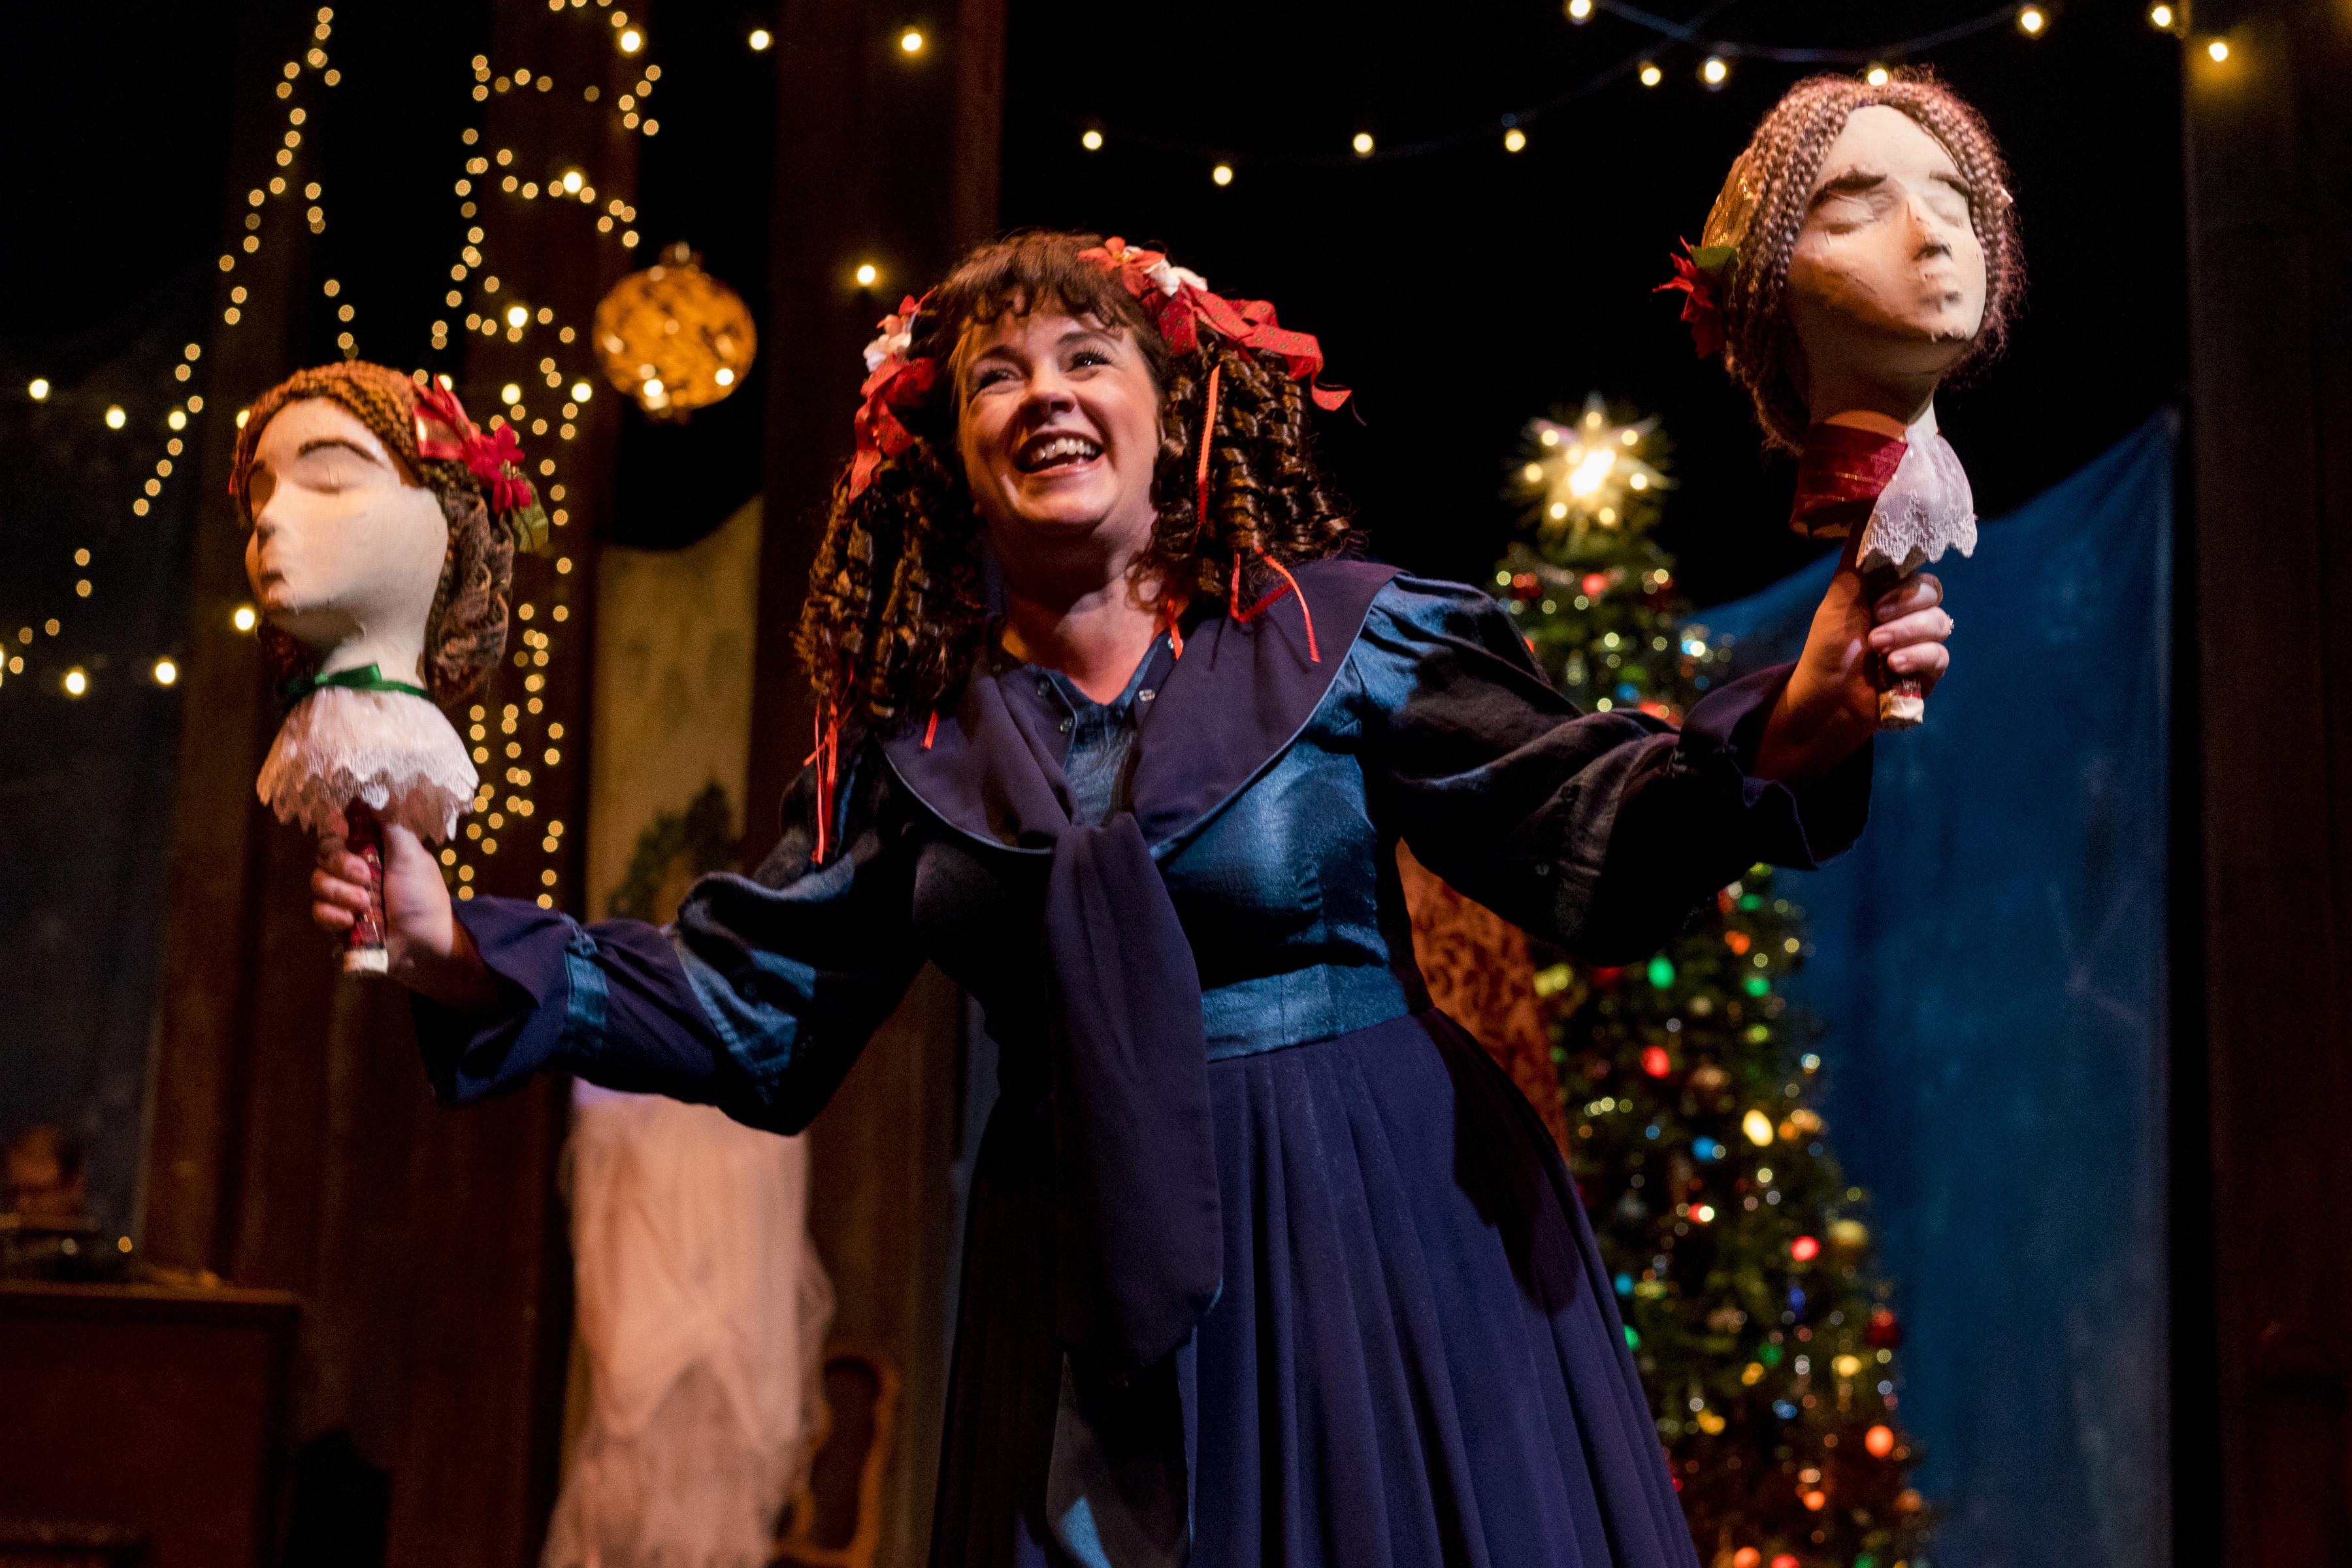 A Christmas Carol Cast.A Holiday Q A With The Cast Of A Christmas Carol Cygnet Blog